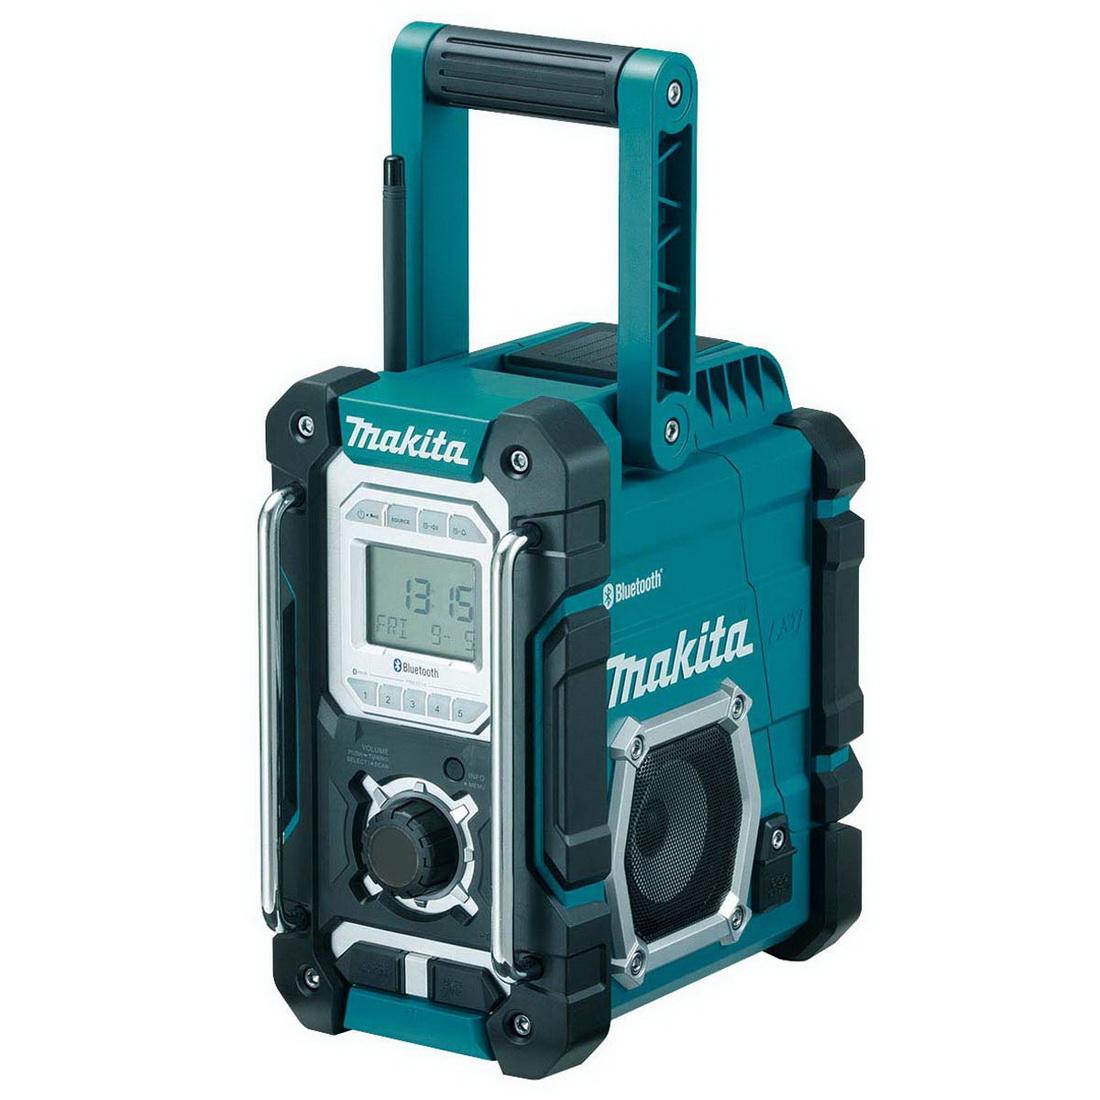 7.2-18V Teal Cordless Bluetooth Jobsite Radio